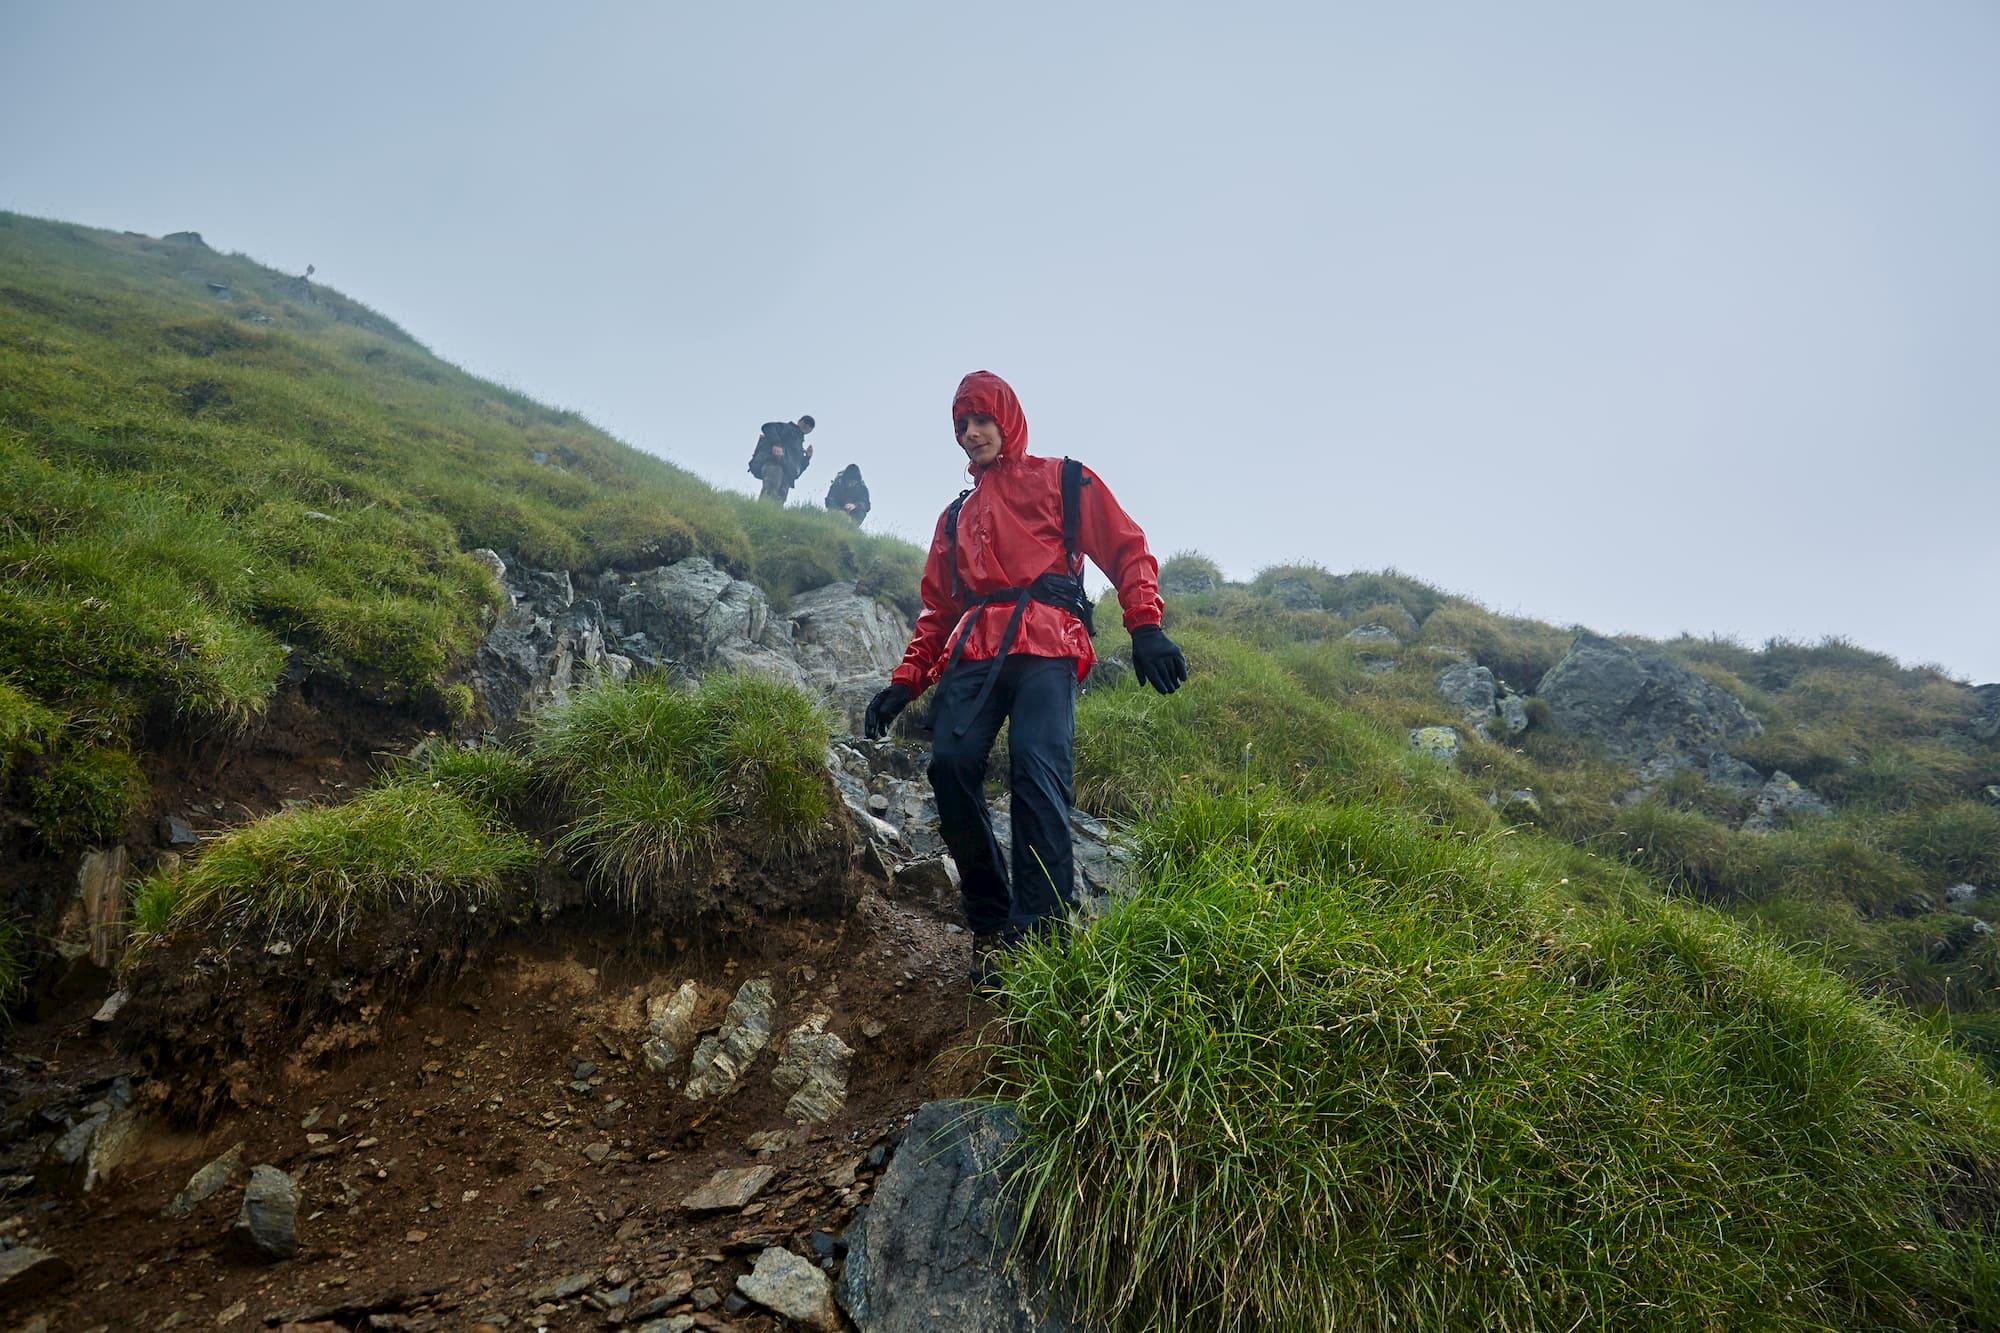 Hikers walking through alpine field in the rain.